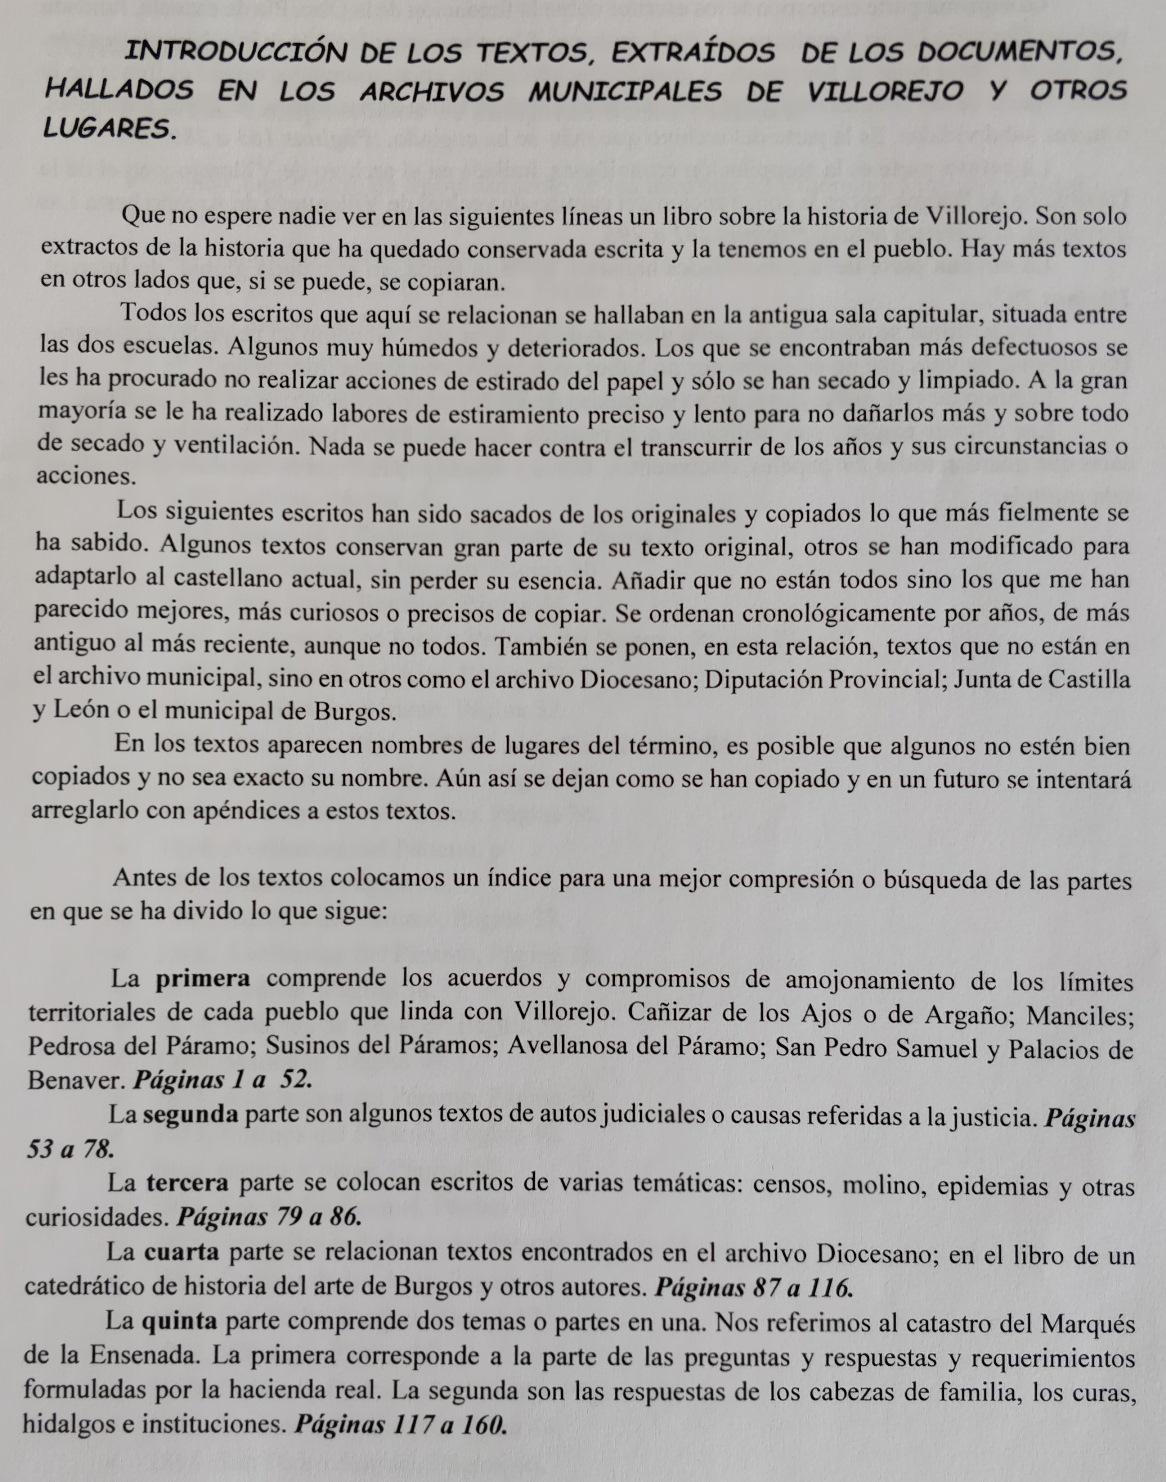 Libros-Alberto-3.jpg